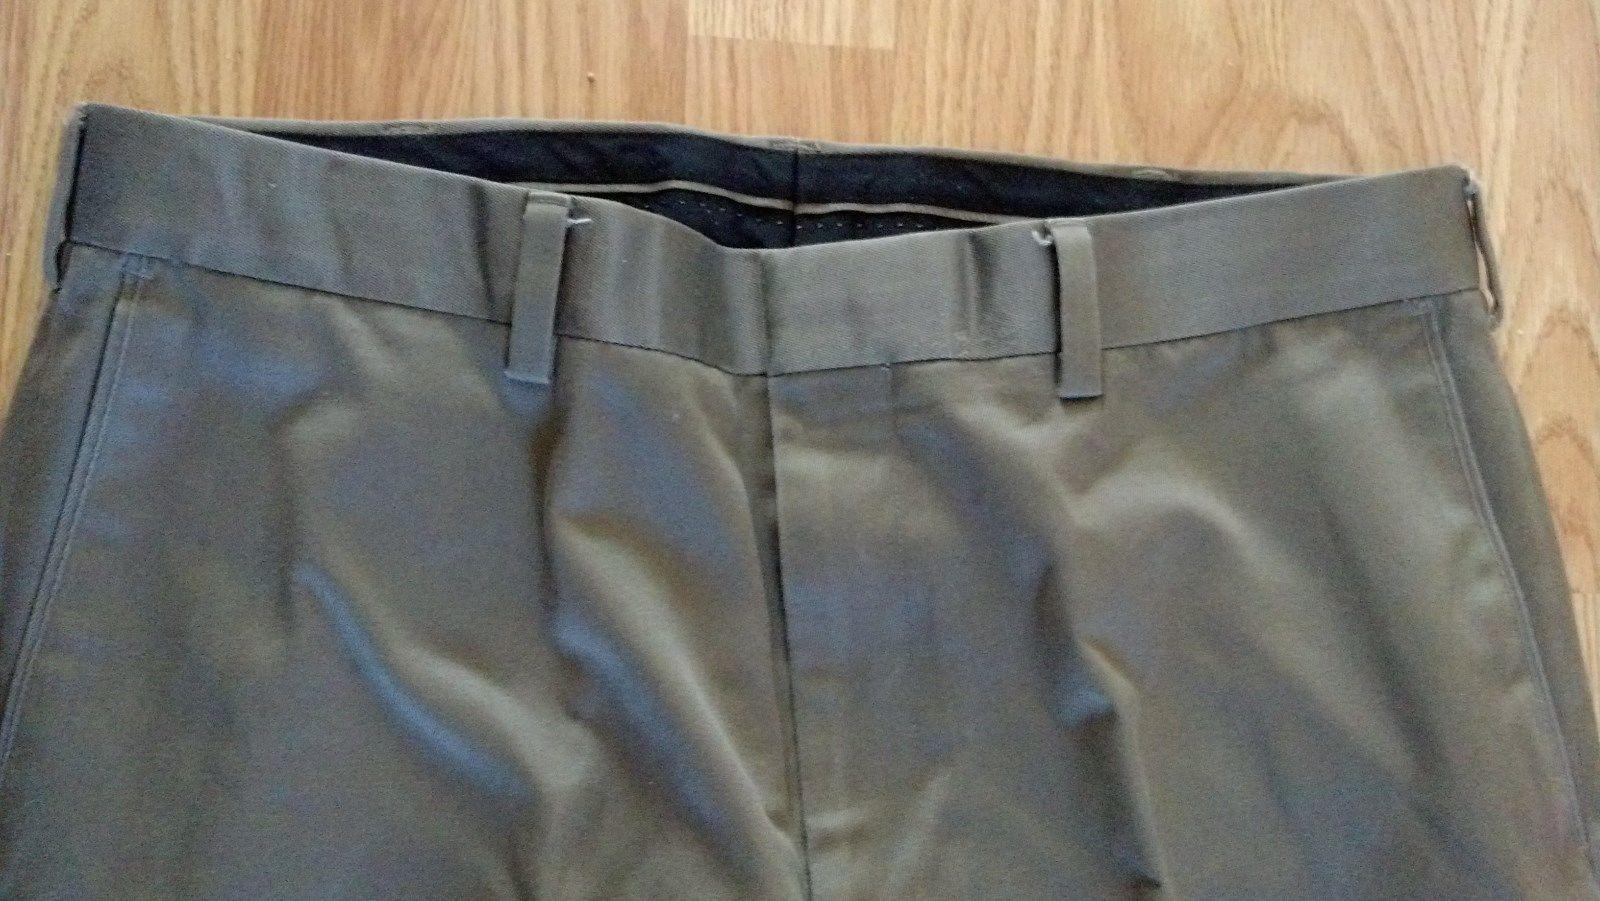 Men's W34 L32 Light Brown Pocketed AXIST Flat Front Dress Cuffed Pants